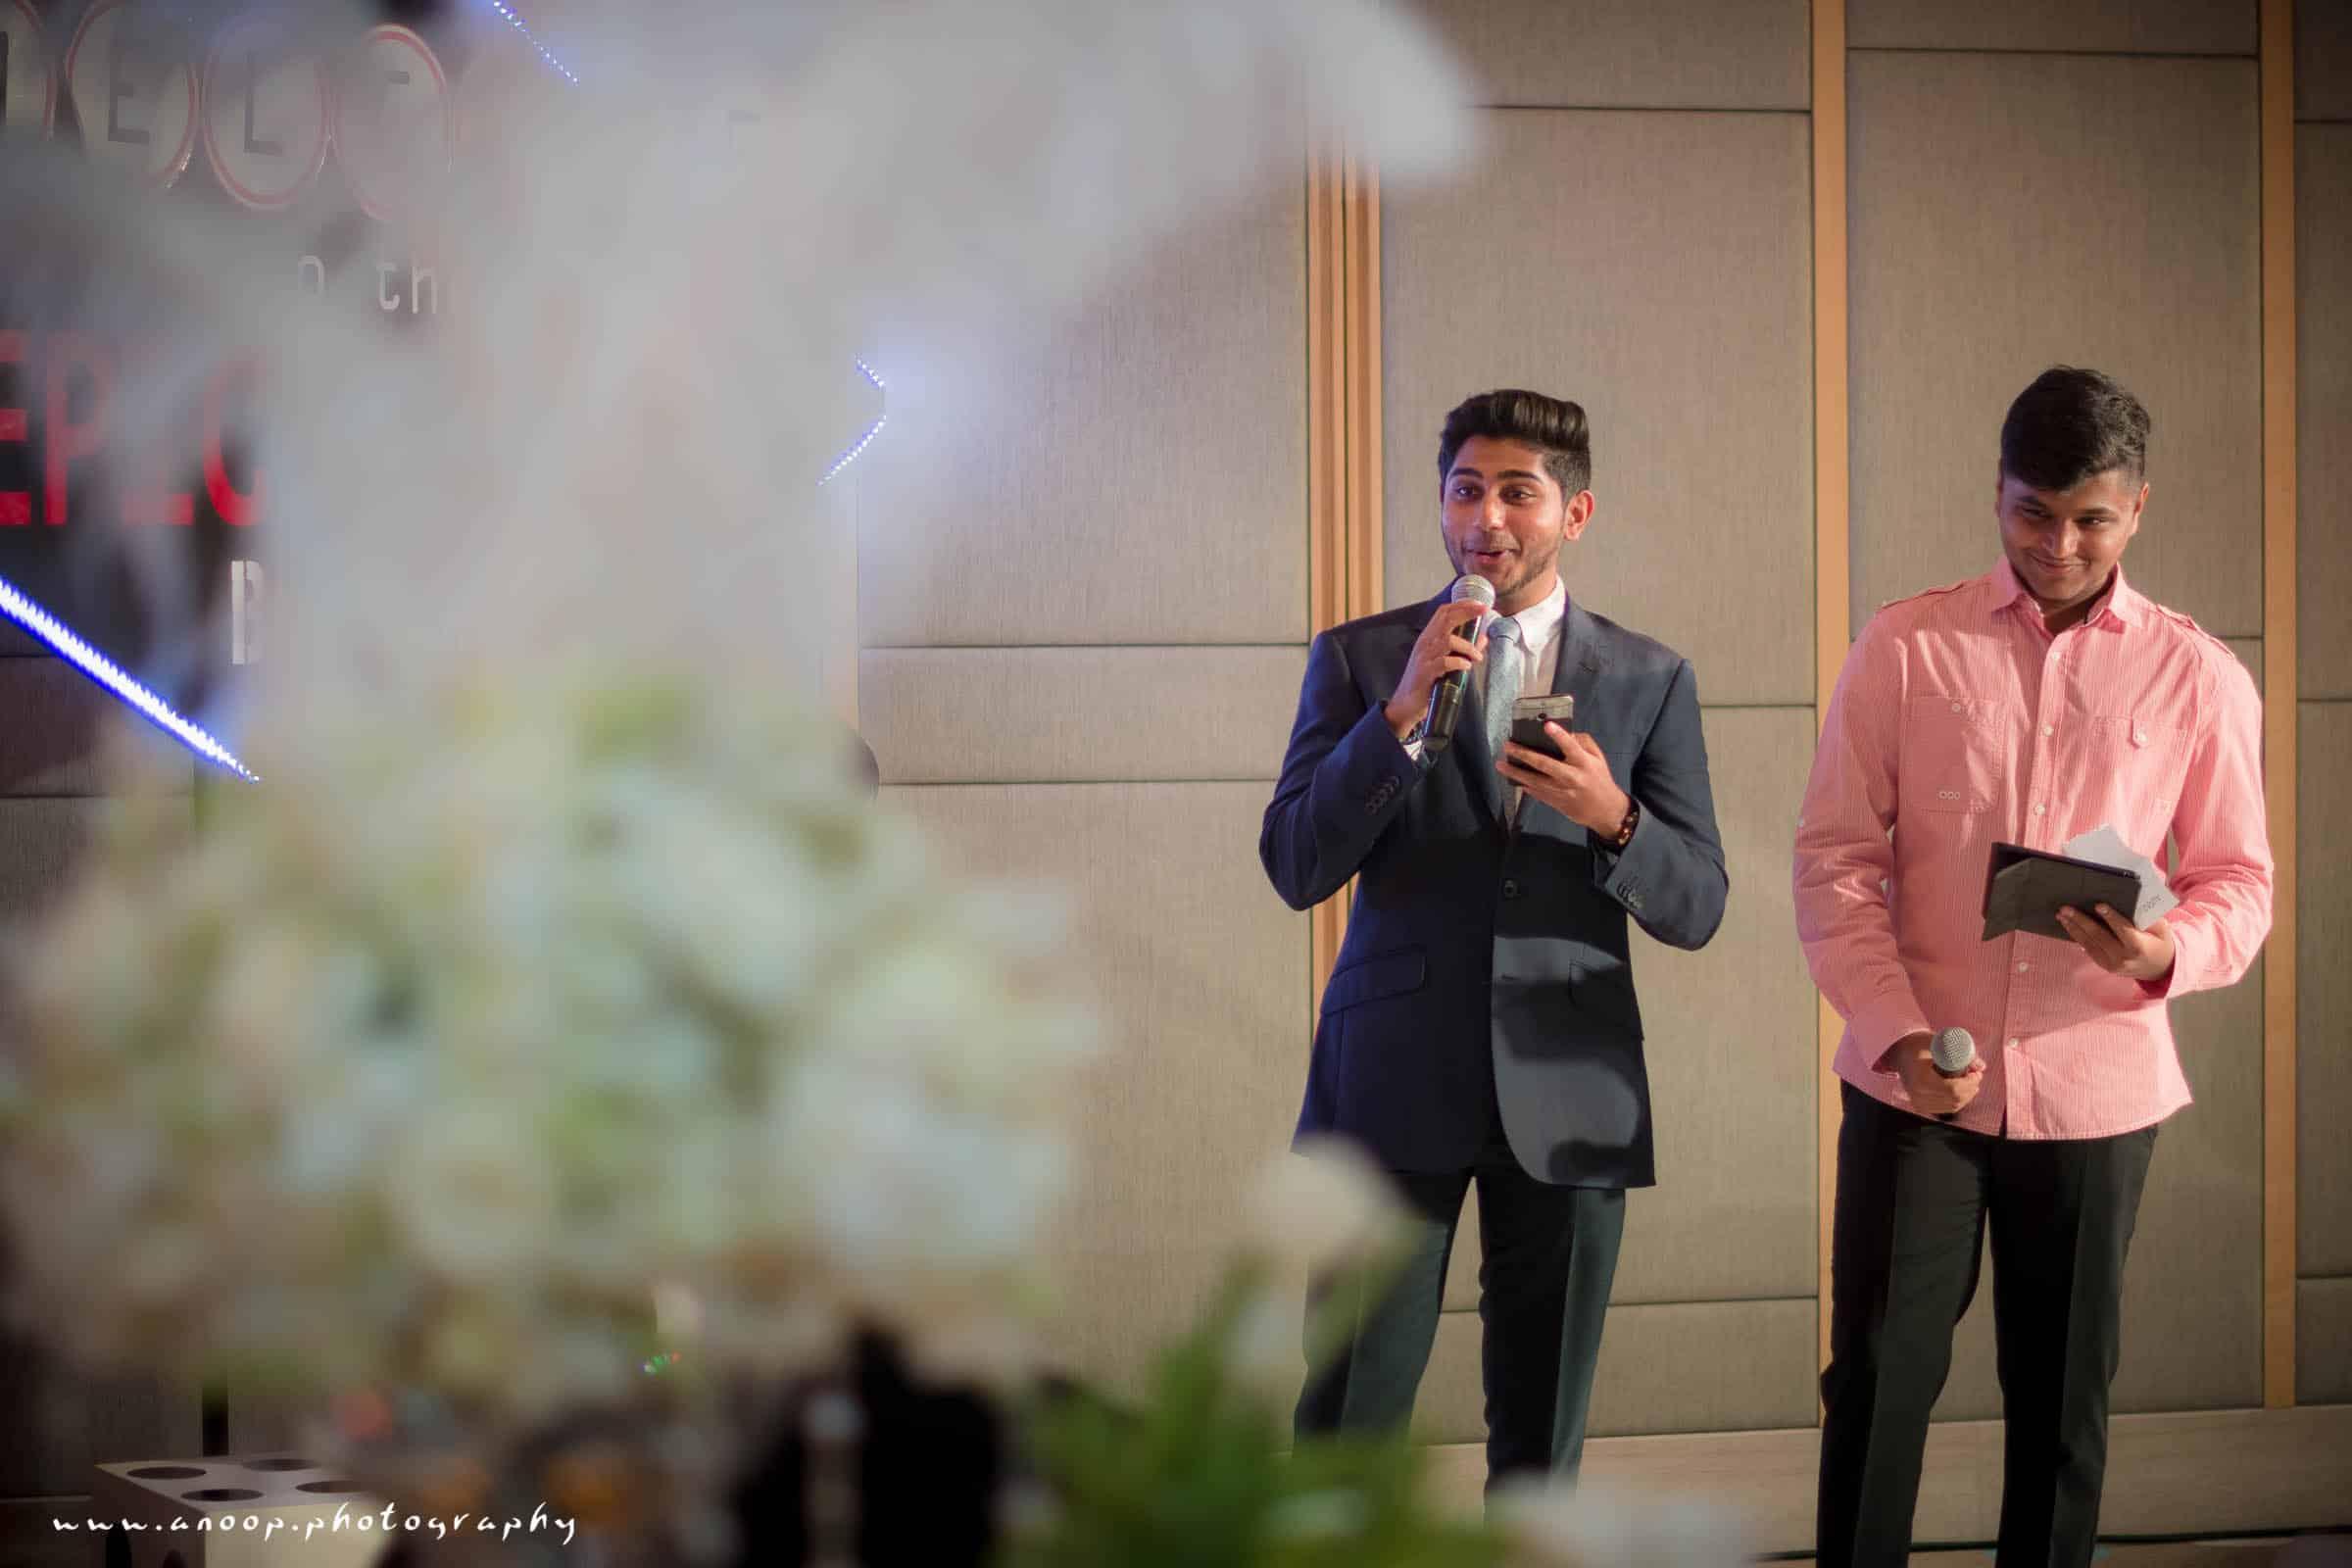 anantara-avani-riverside-bangkok-ballroom-celebrations-33